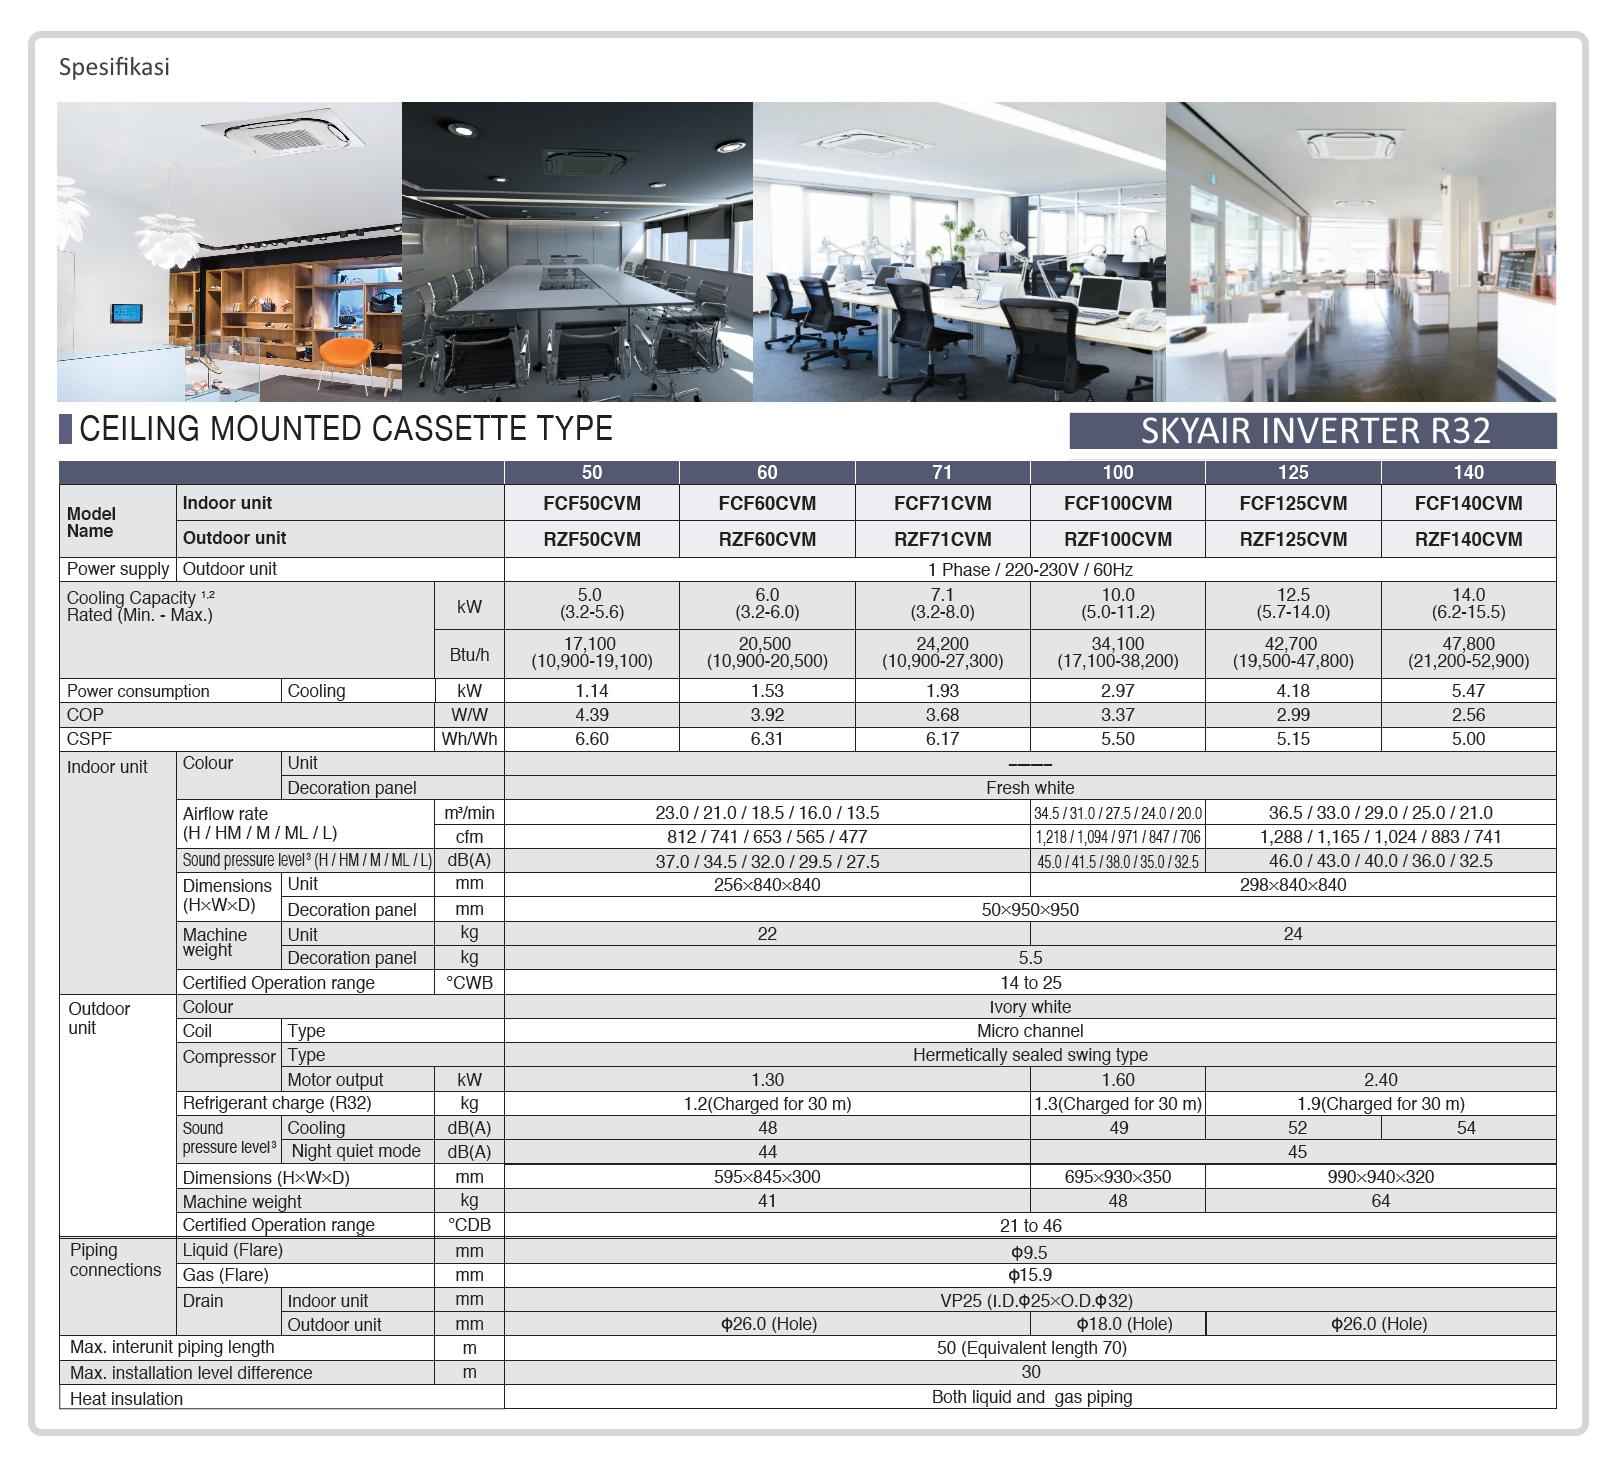 Daikin SkyAir R32 - FCF - Spesifikasi AC Cassette Daikin INVERTER - Roundflow - Harga Jual Daikin Permata Teknik